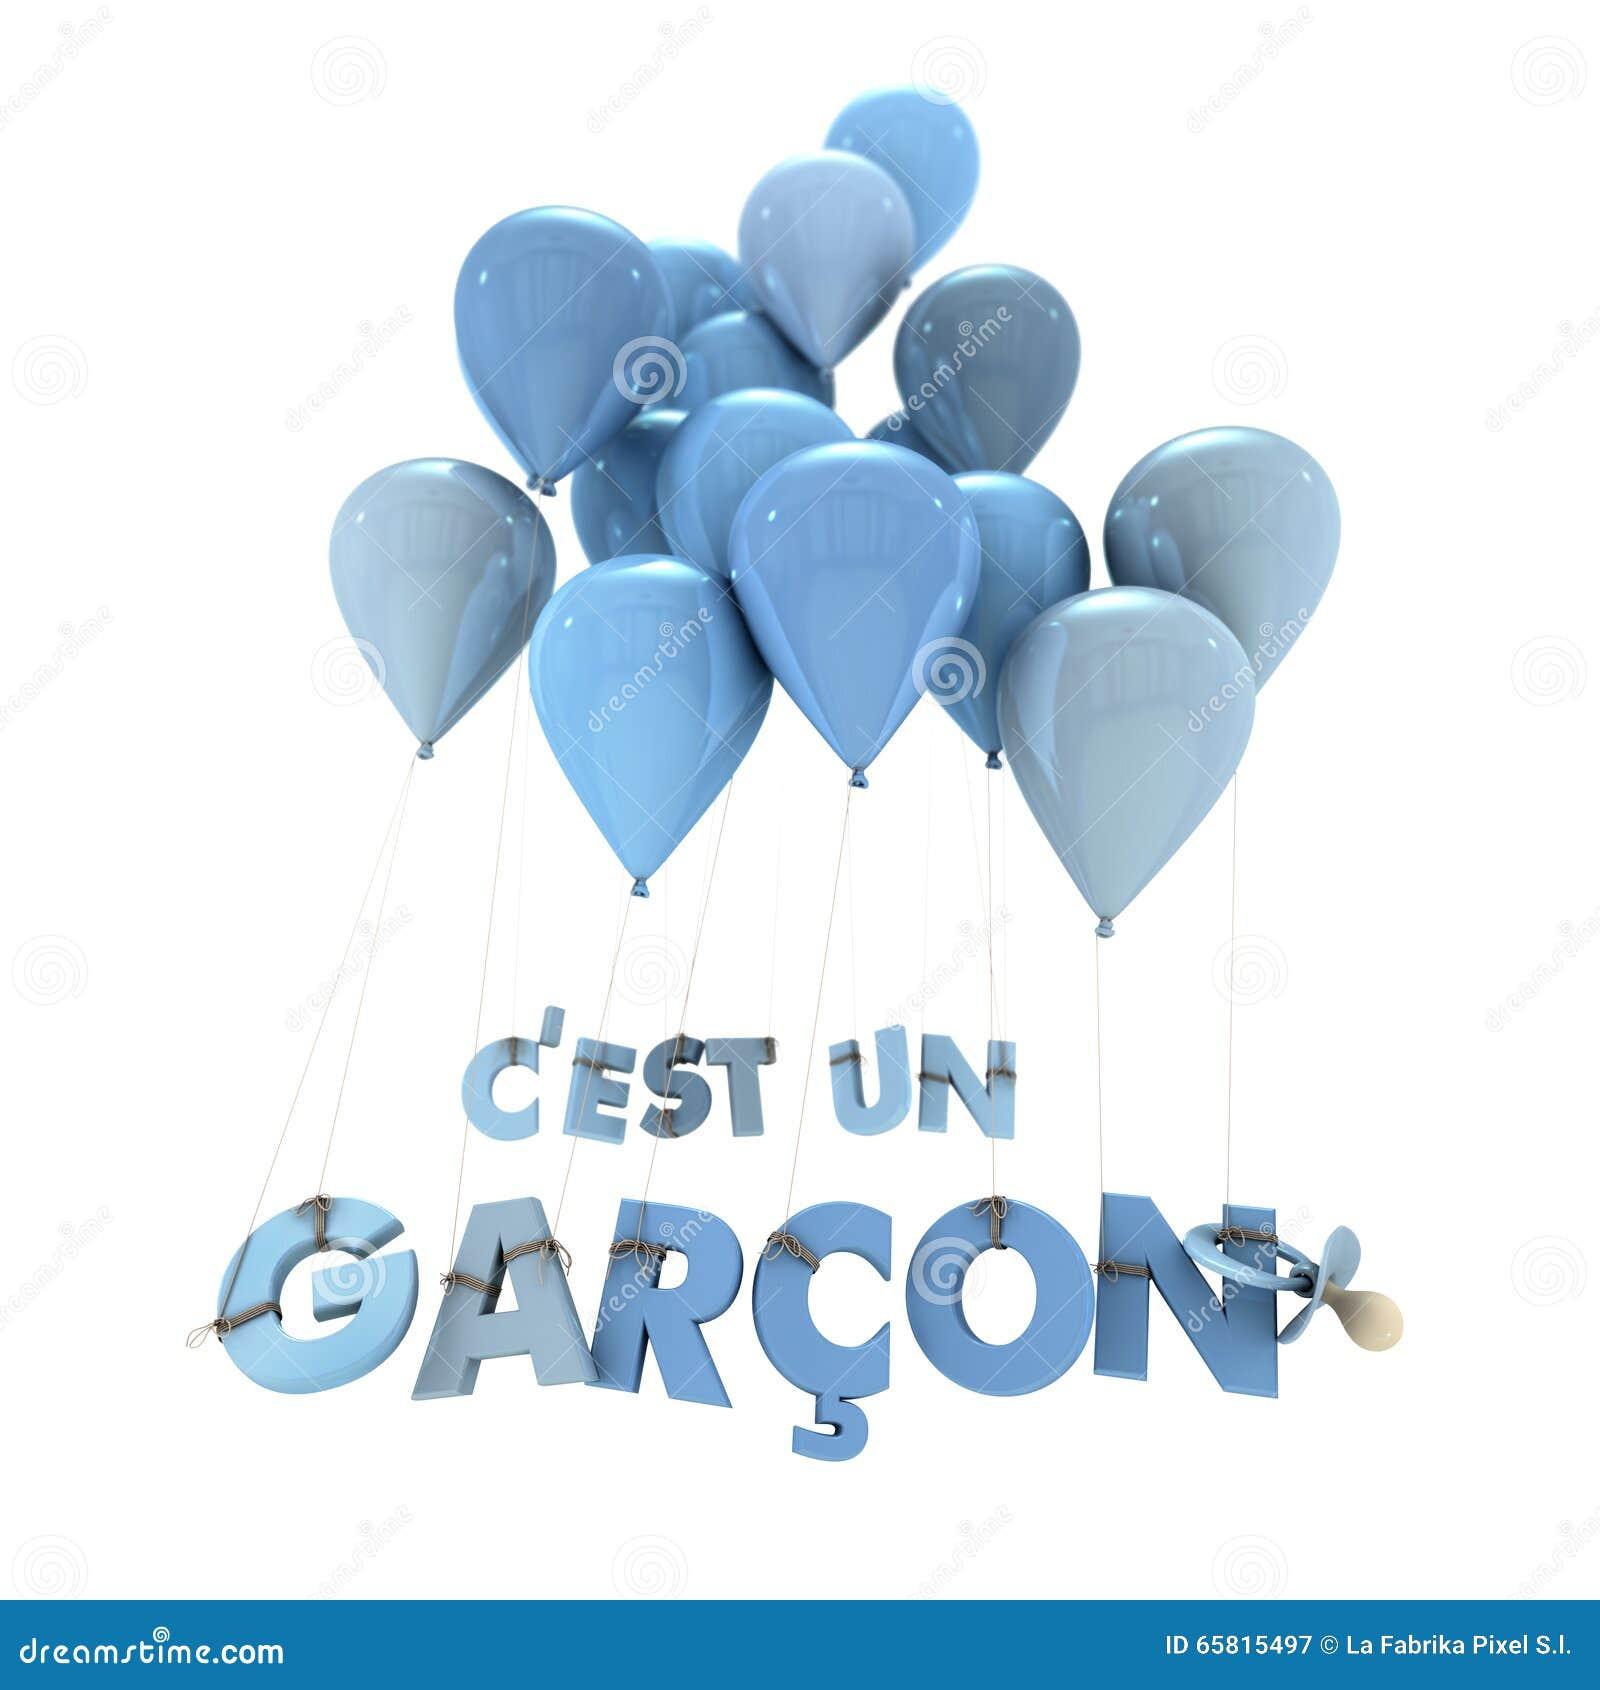 French Baby Boy Birth Announcement Illustration Image – Baby Boy Birth Announcement Sayings